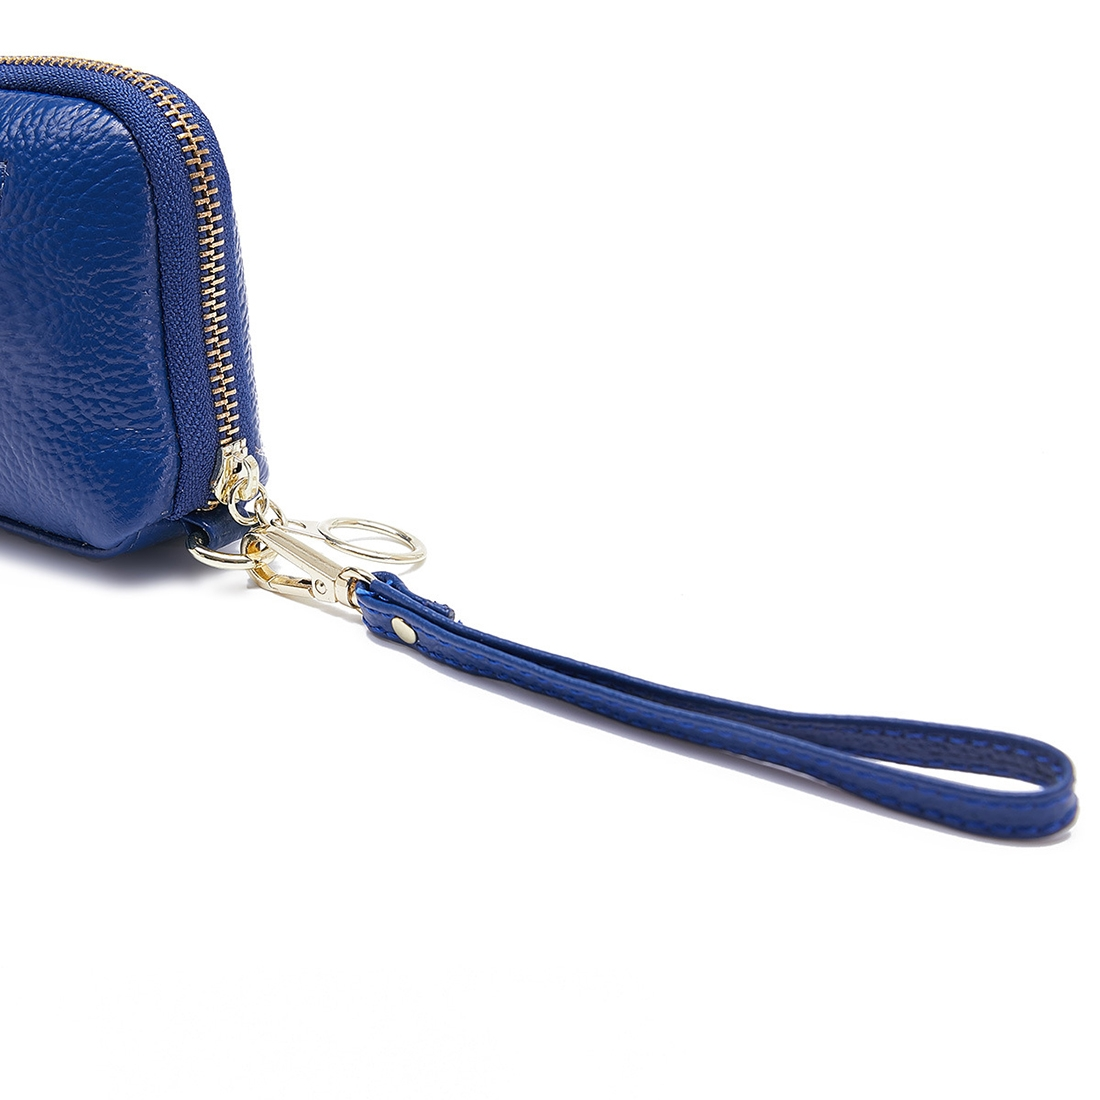 2-Folding Square Genuine Leather Handbag (Blue)